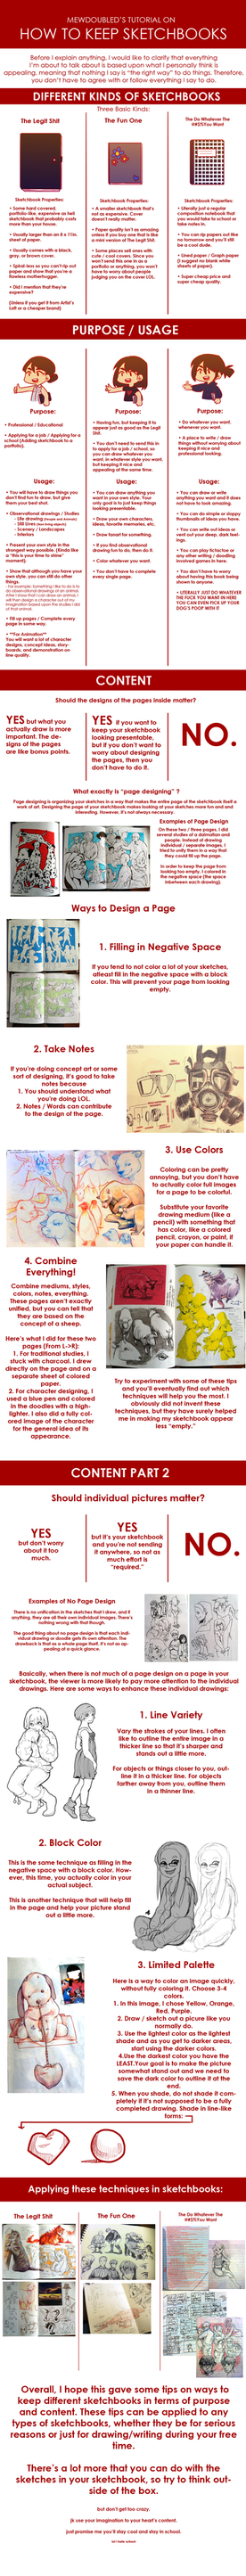 How to Keep Sketchbooks